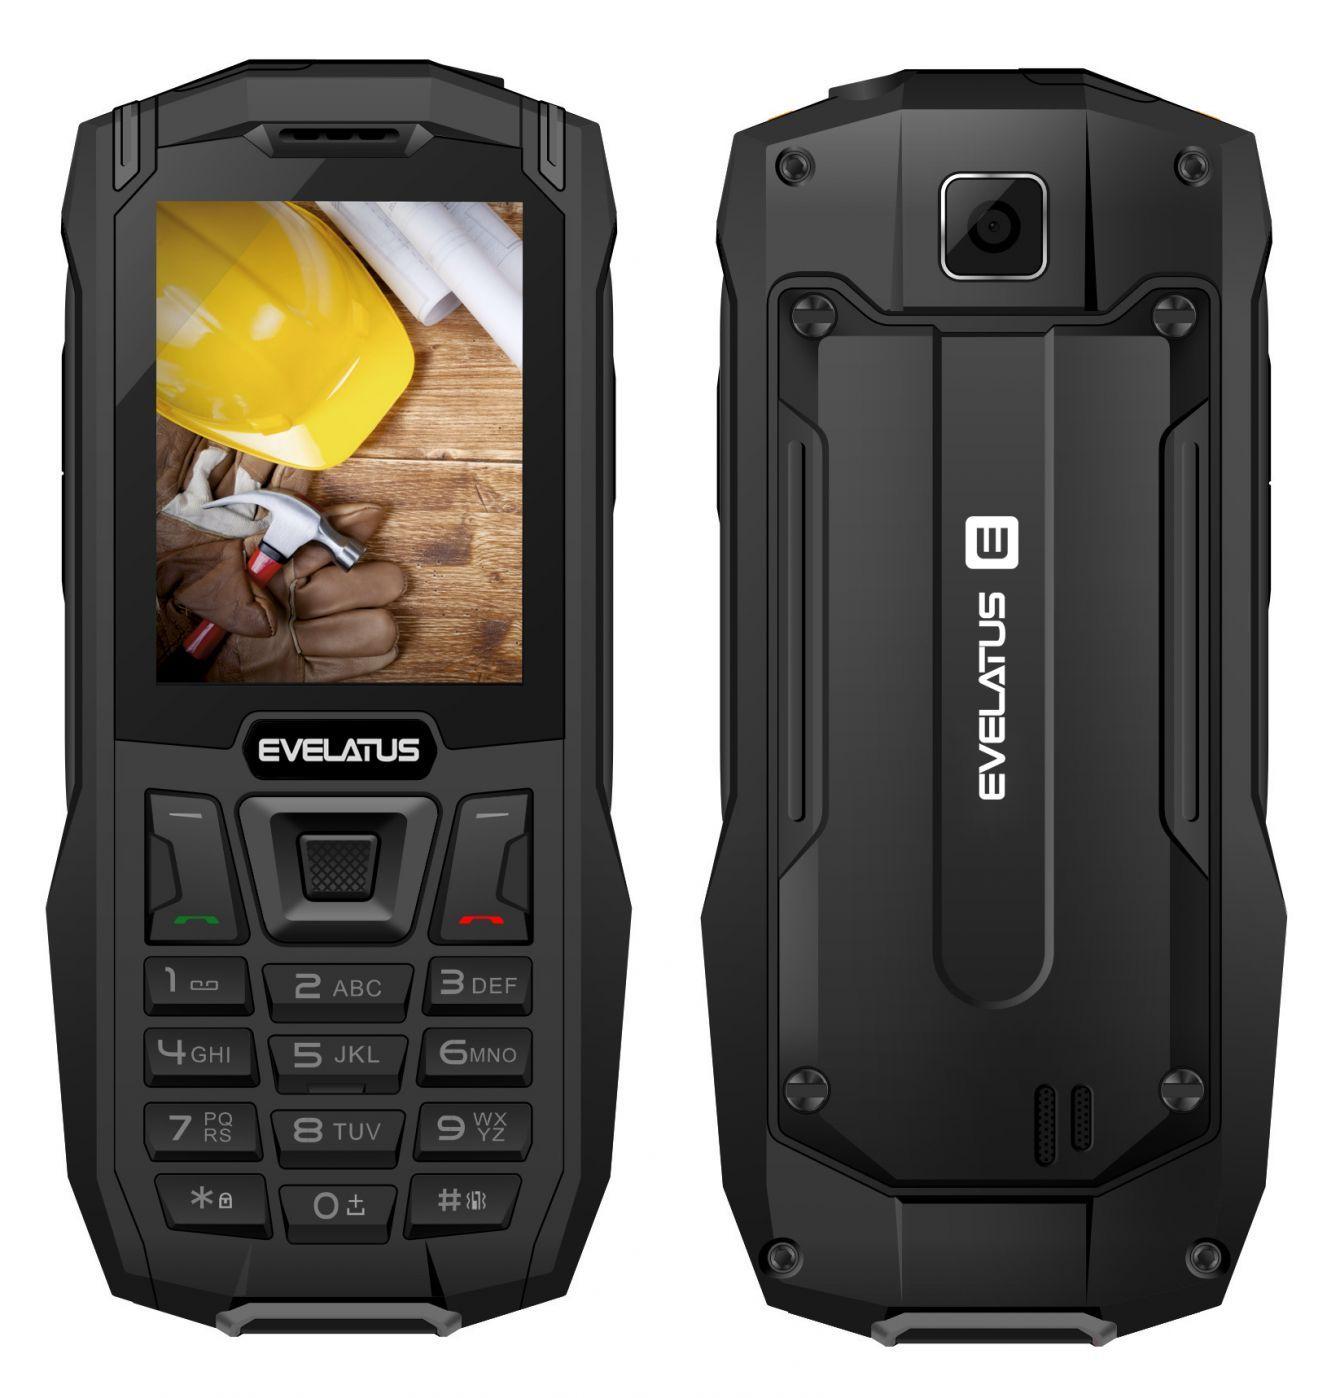 Evelatus ROCK Dual Sim Black (LAT, RUS, ENG) Mobilais Telefons